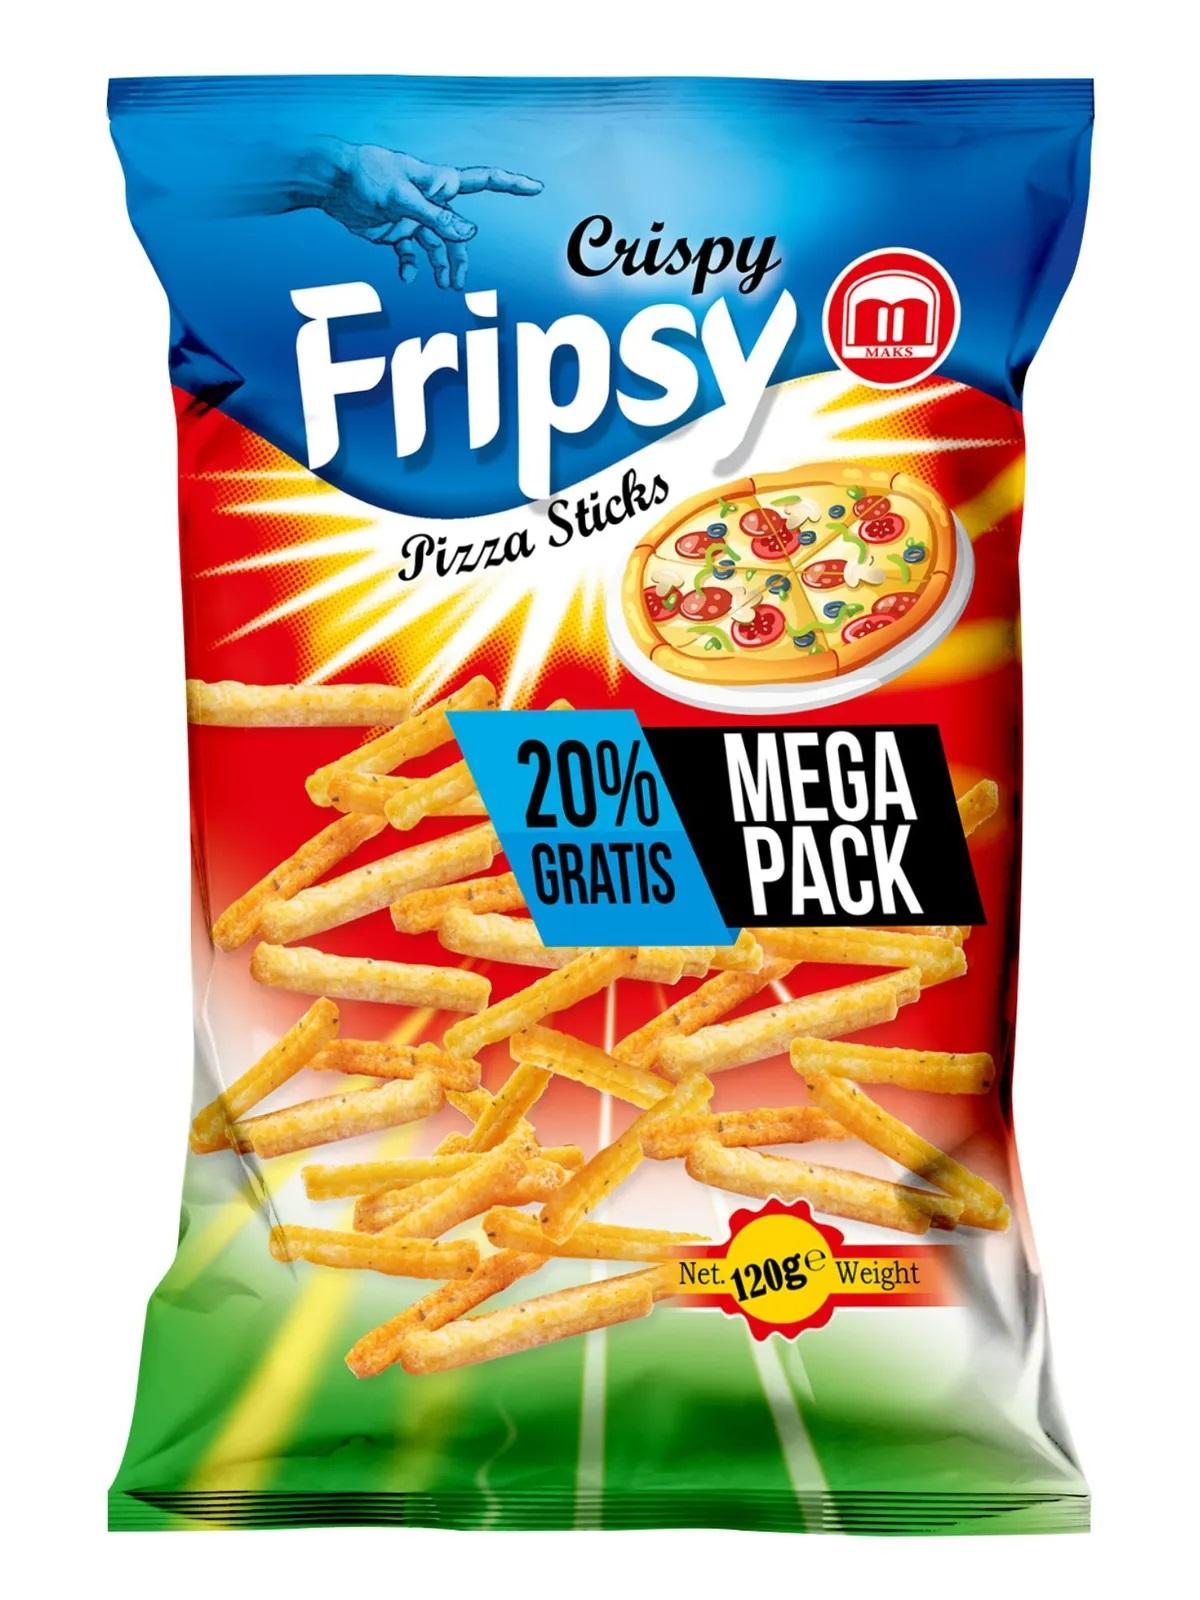 Crispy Fripsy Pizza 120g